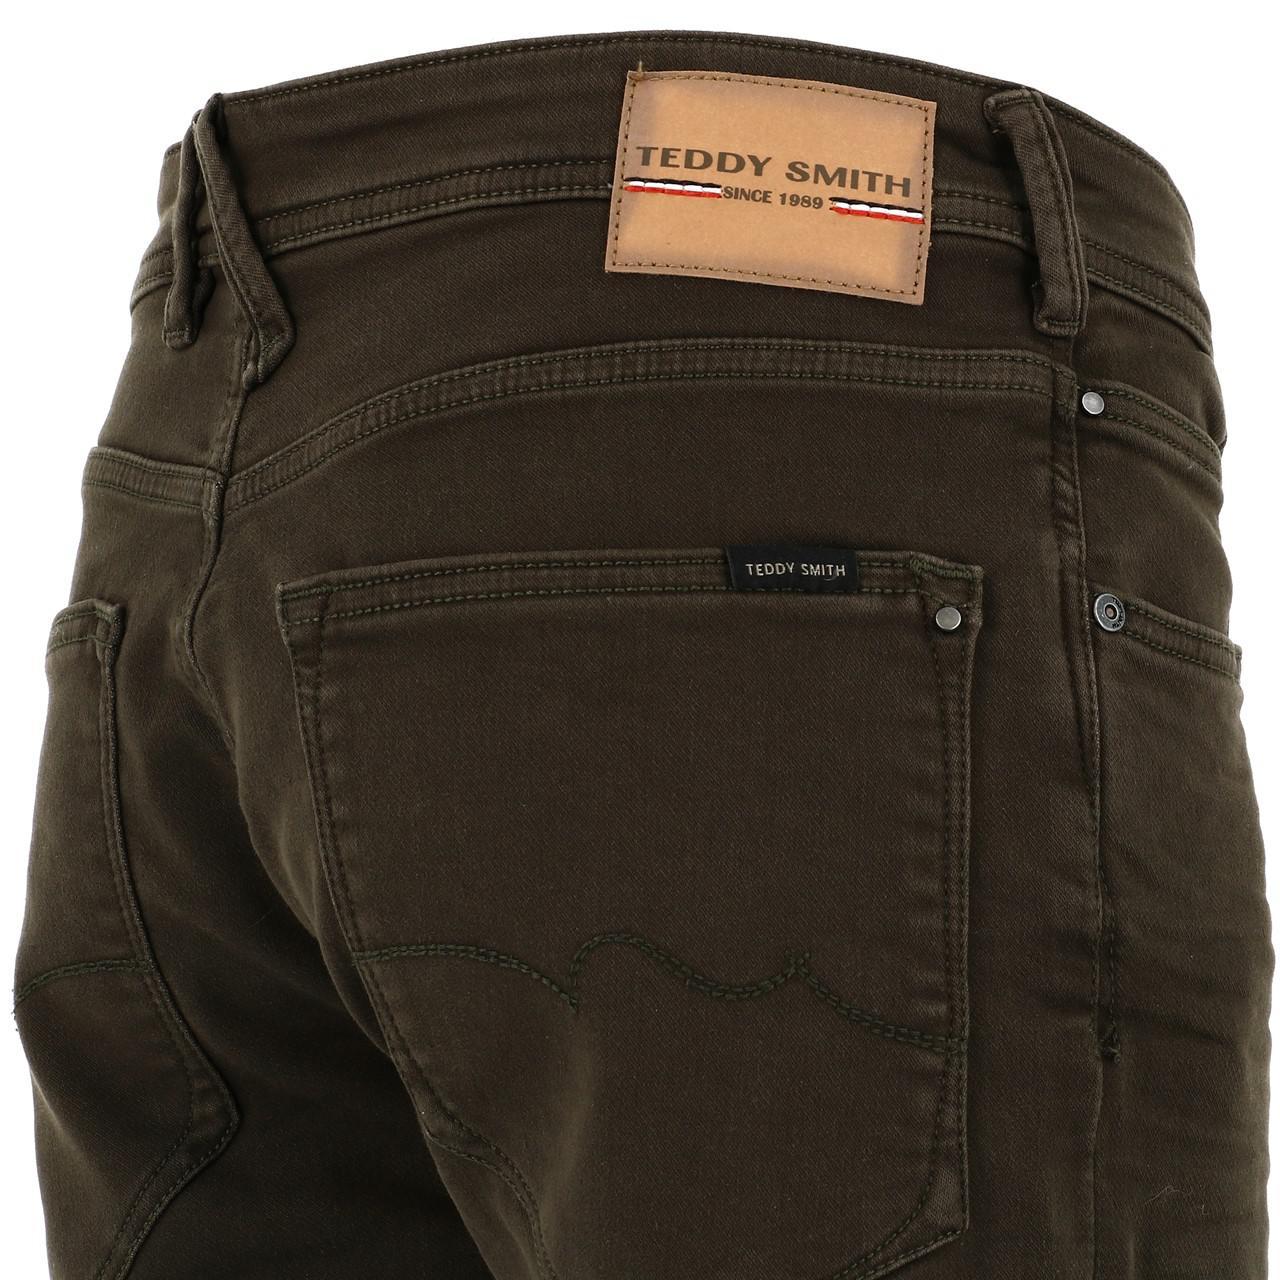 Bermuda-Shorts-Teddy-Smith-Scotty-3-Middl-Khaki-Shorts-Green-18133-New thumbnail 3